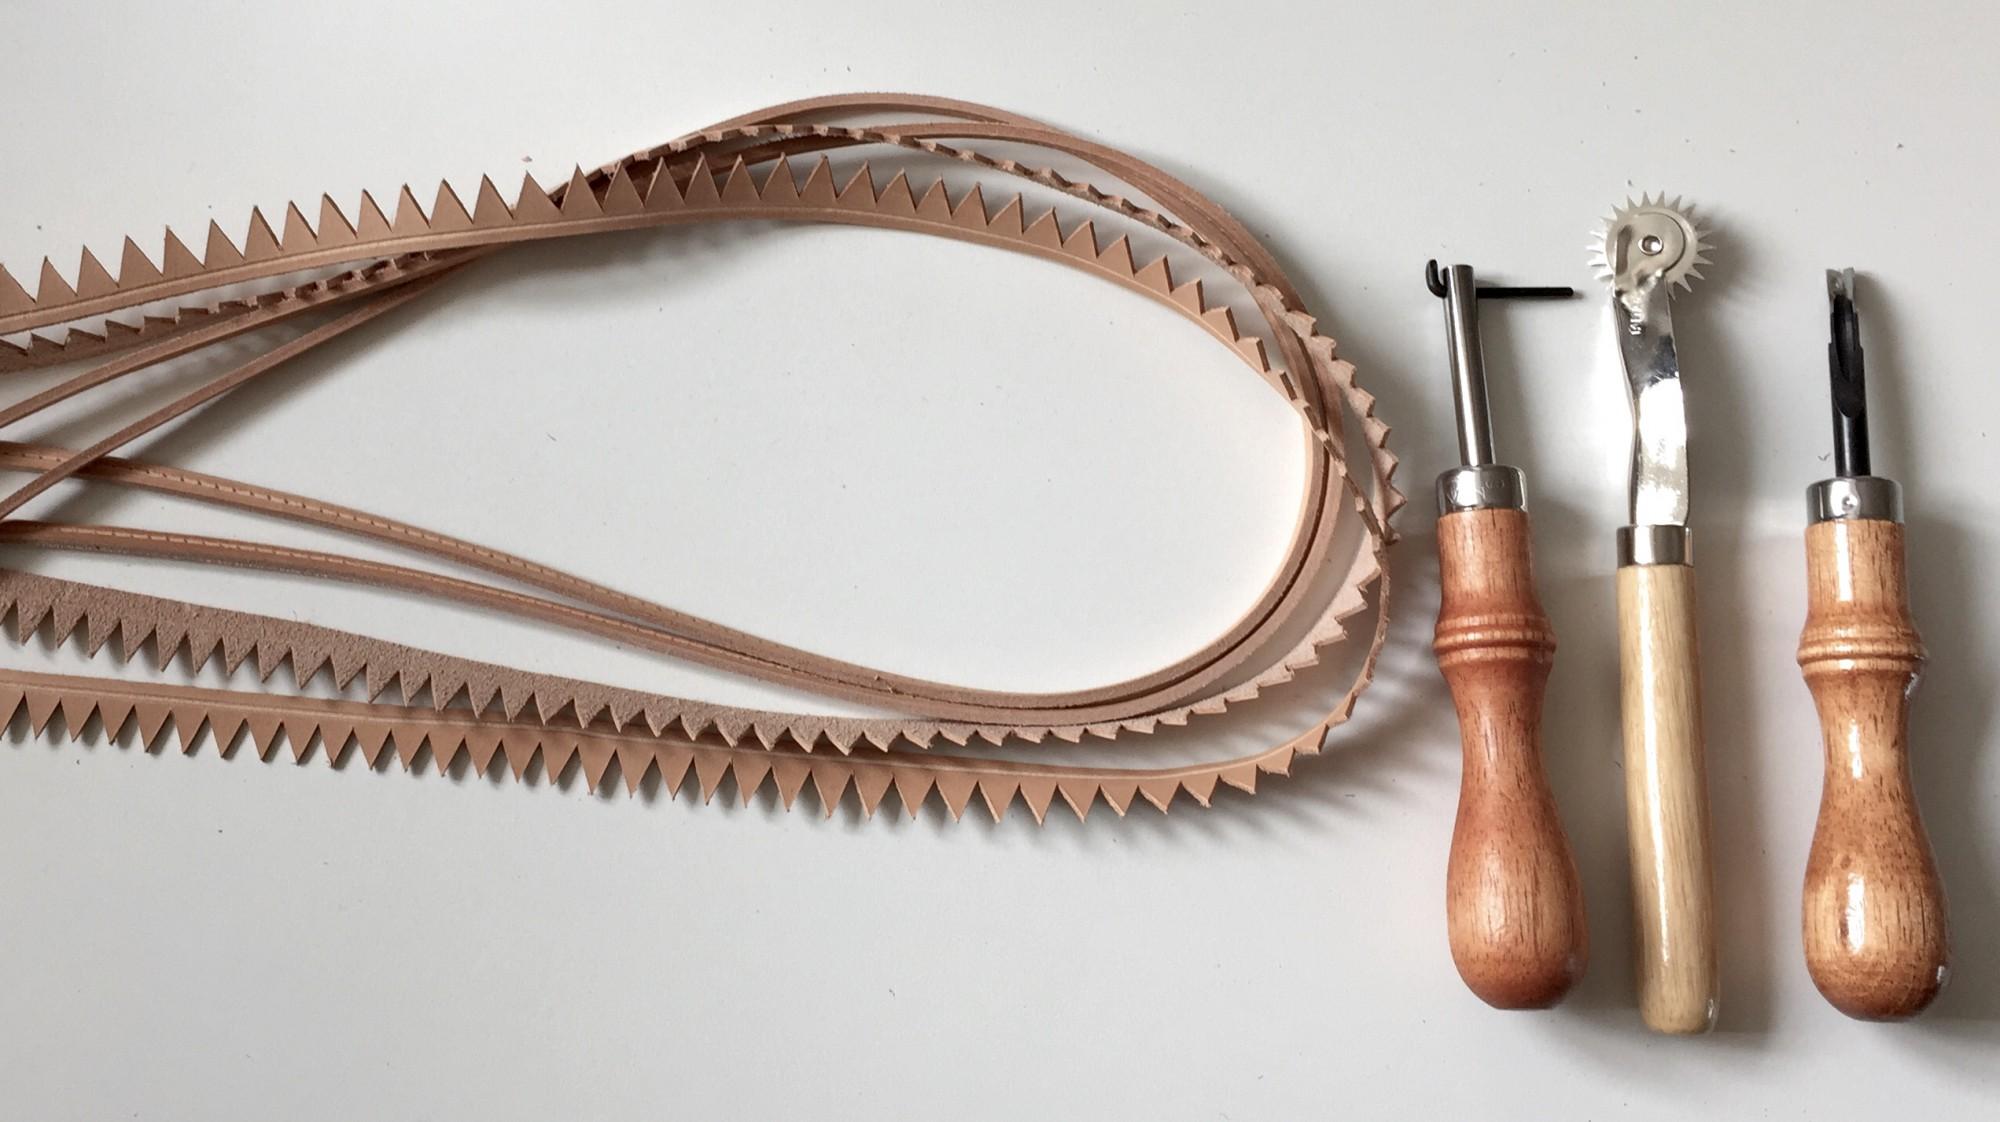 Rand tools